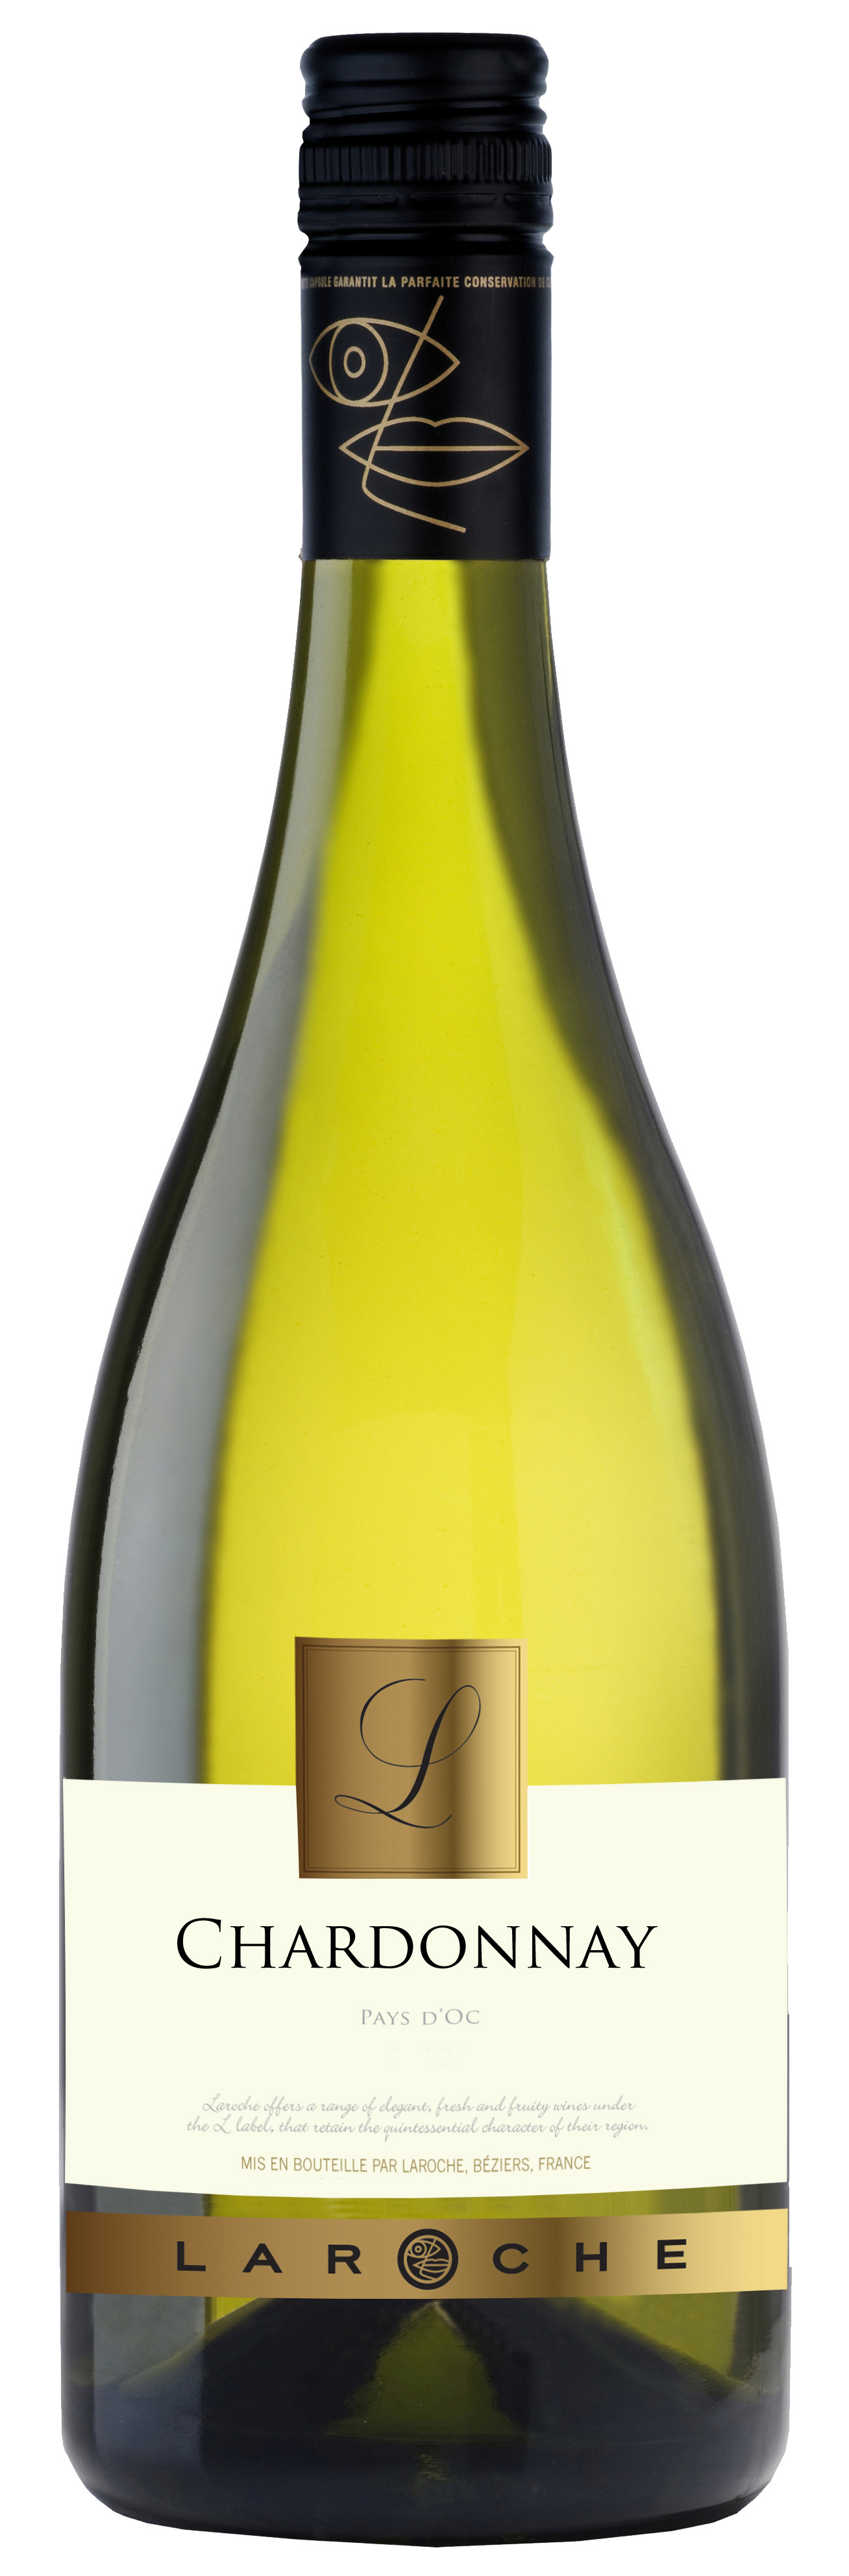 "Laroche Chardonnay ""L"""